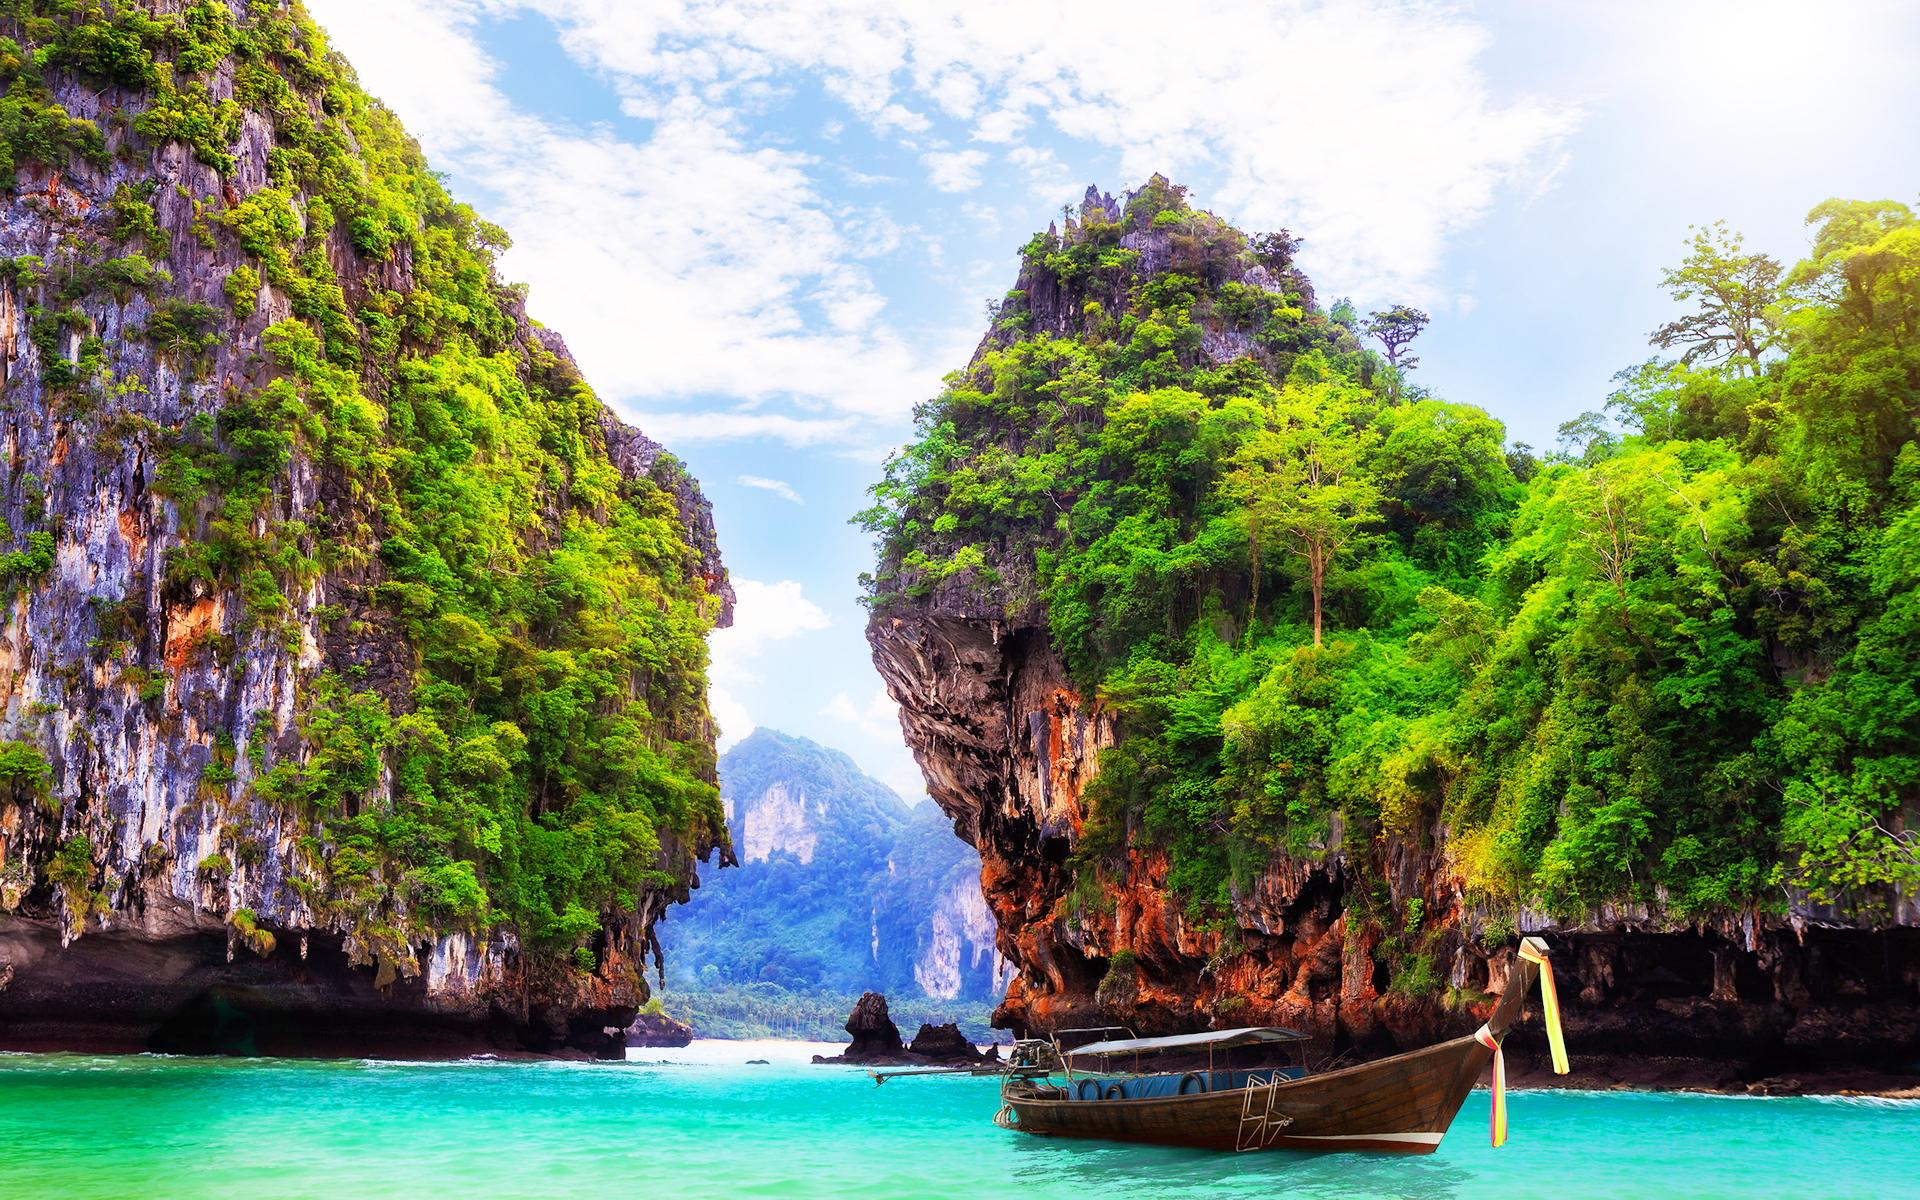 thailand vacation HD Desktop Wallpapers